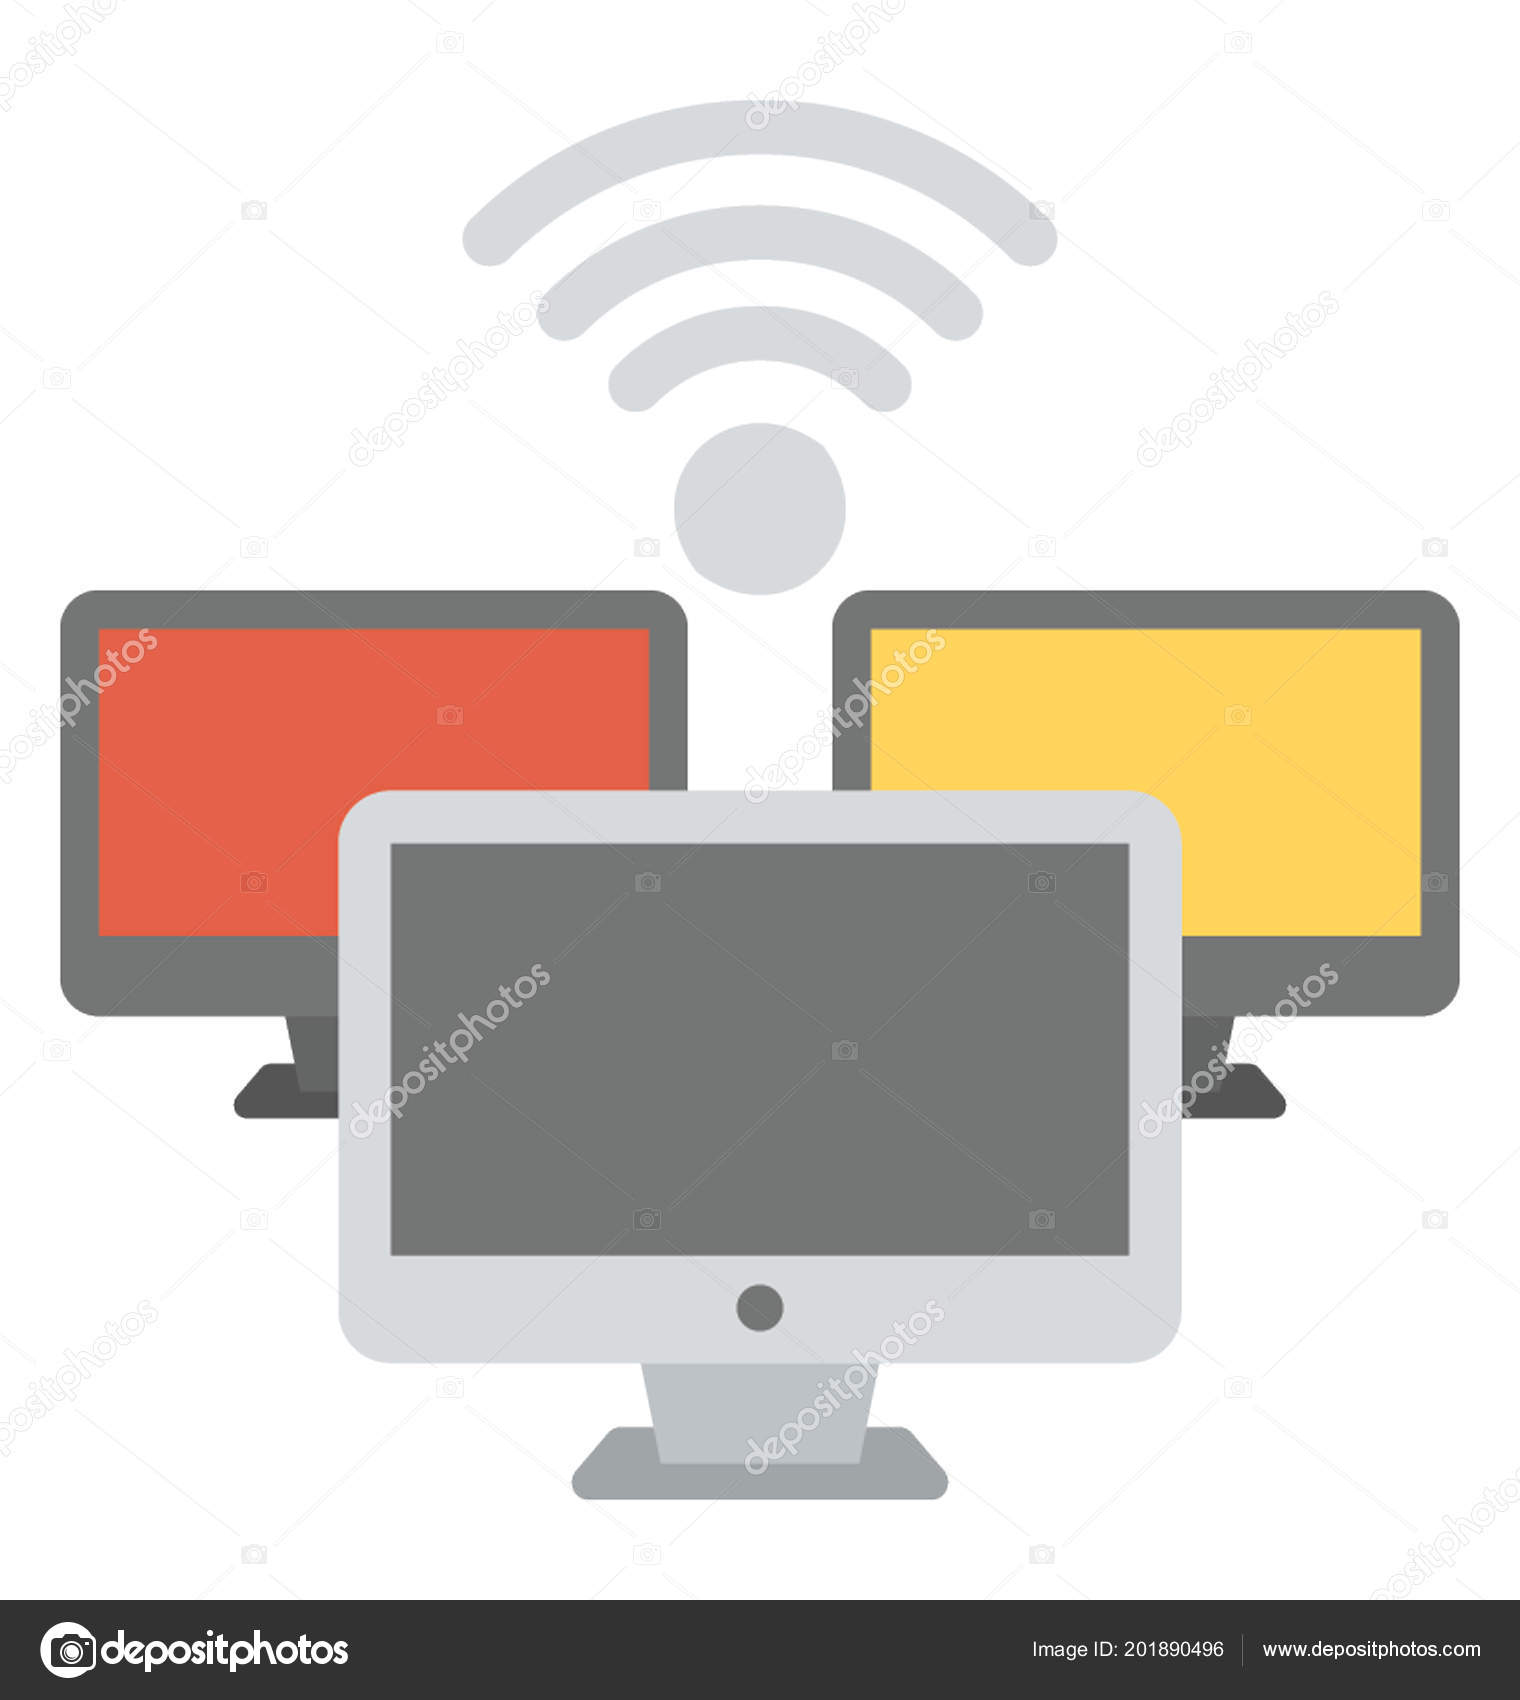 Awe Inspiring Wifi Network Diagram Flat Icon Stock Vector C Vectorsmarket 201890496 Wiring Digital Resources Indicompassionincorg